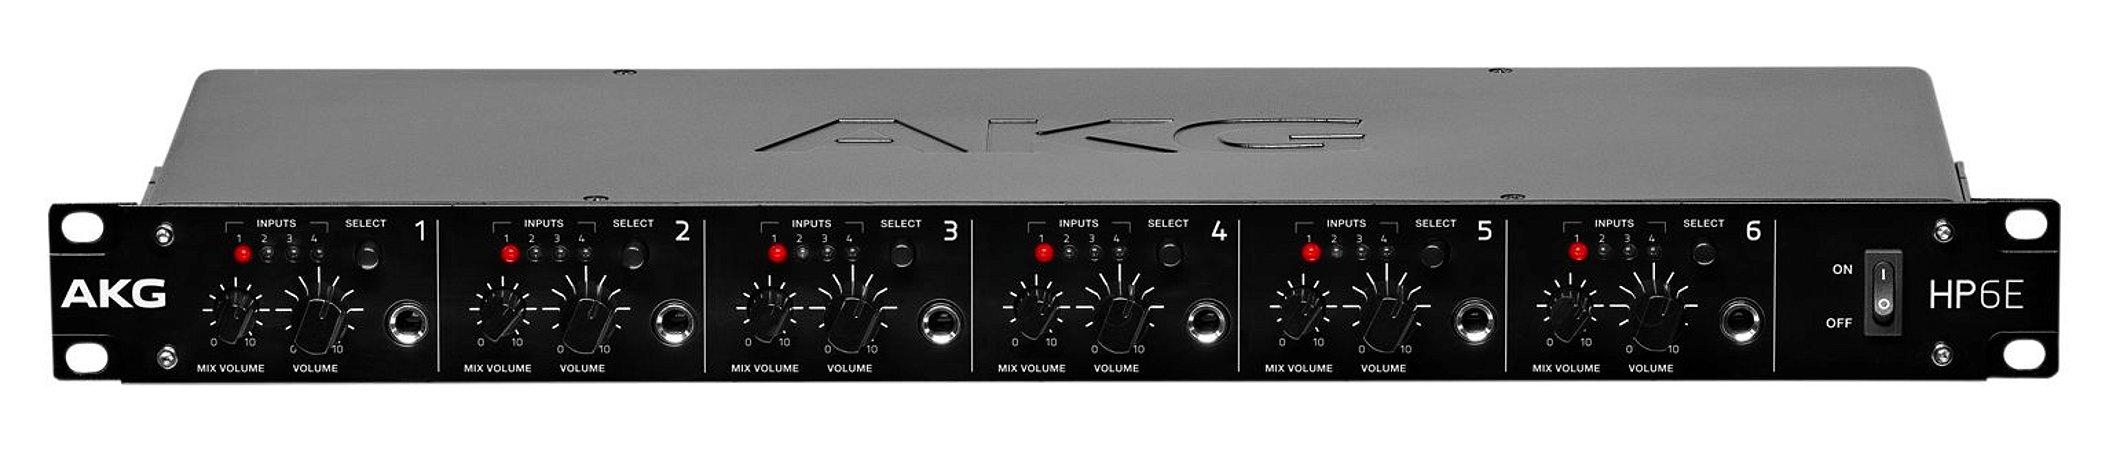 Pré Amplificador AKG HP6E 6 Canais para Fone de Ouvido